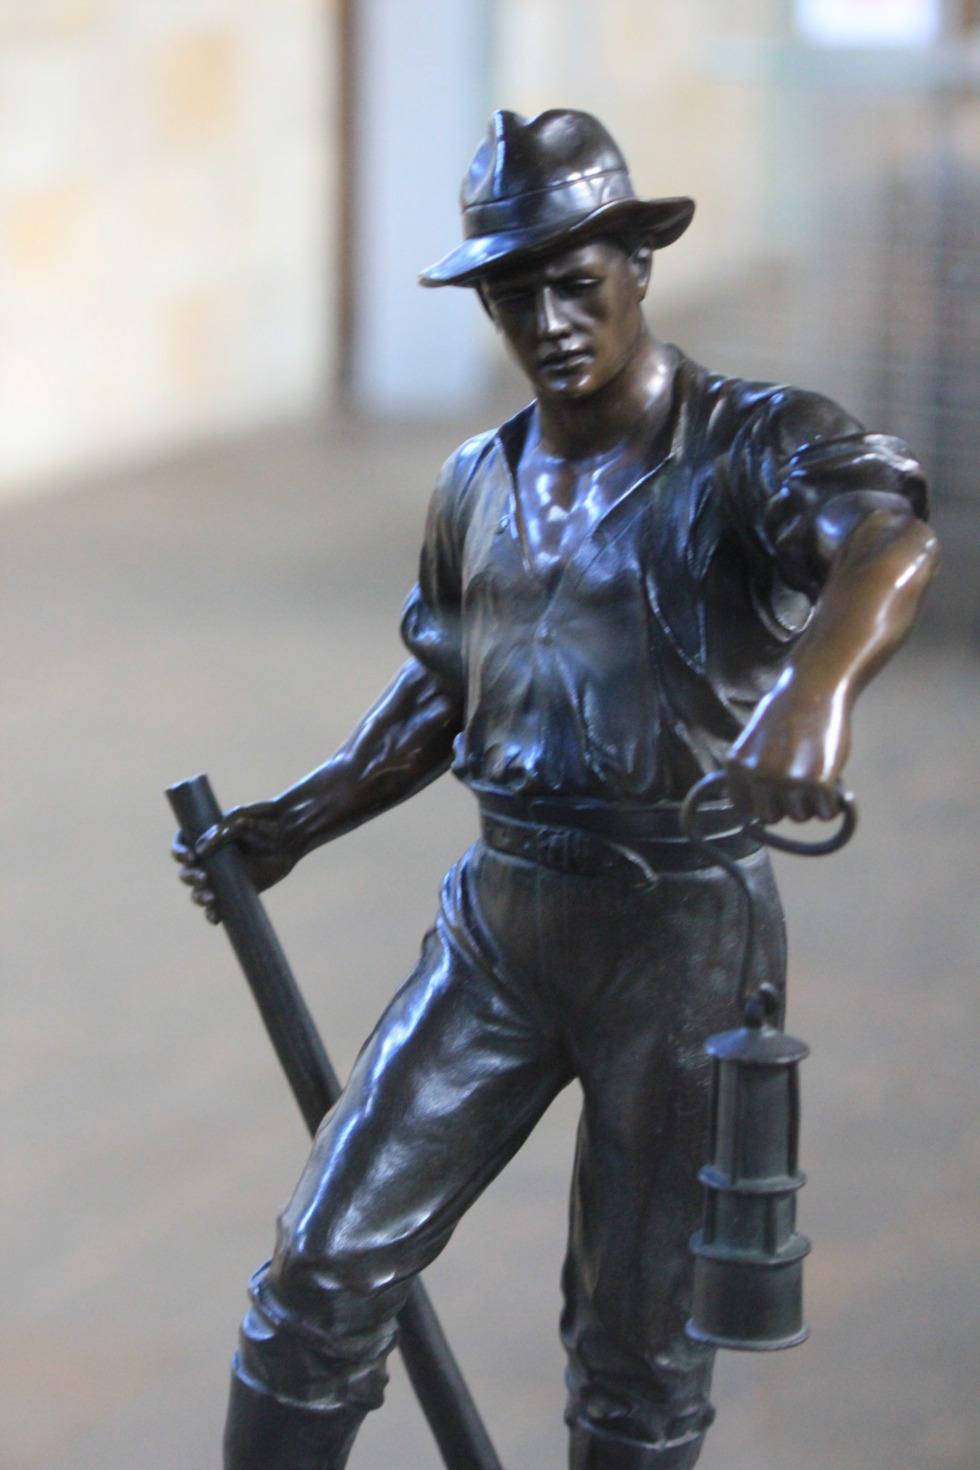 Sculpture of digger